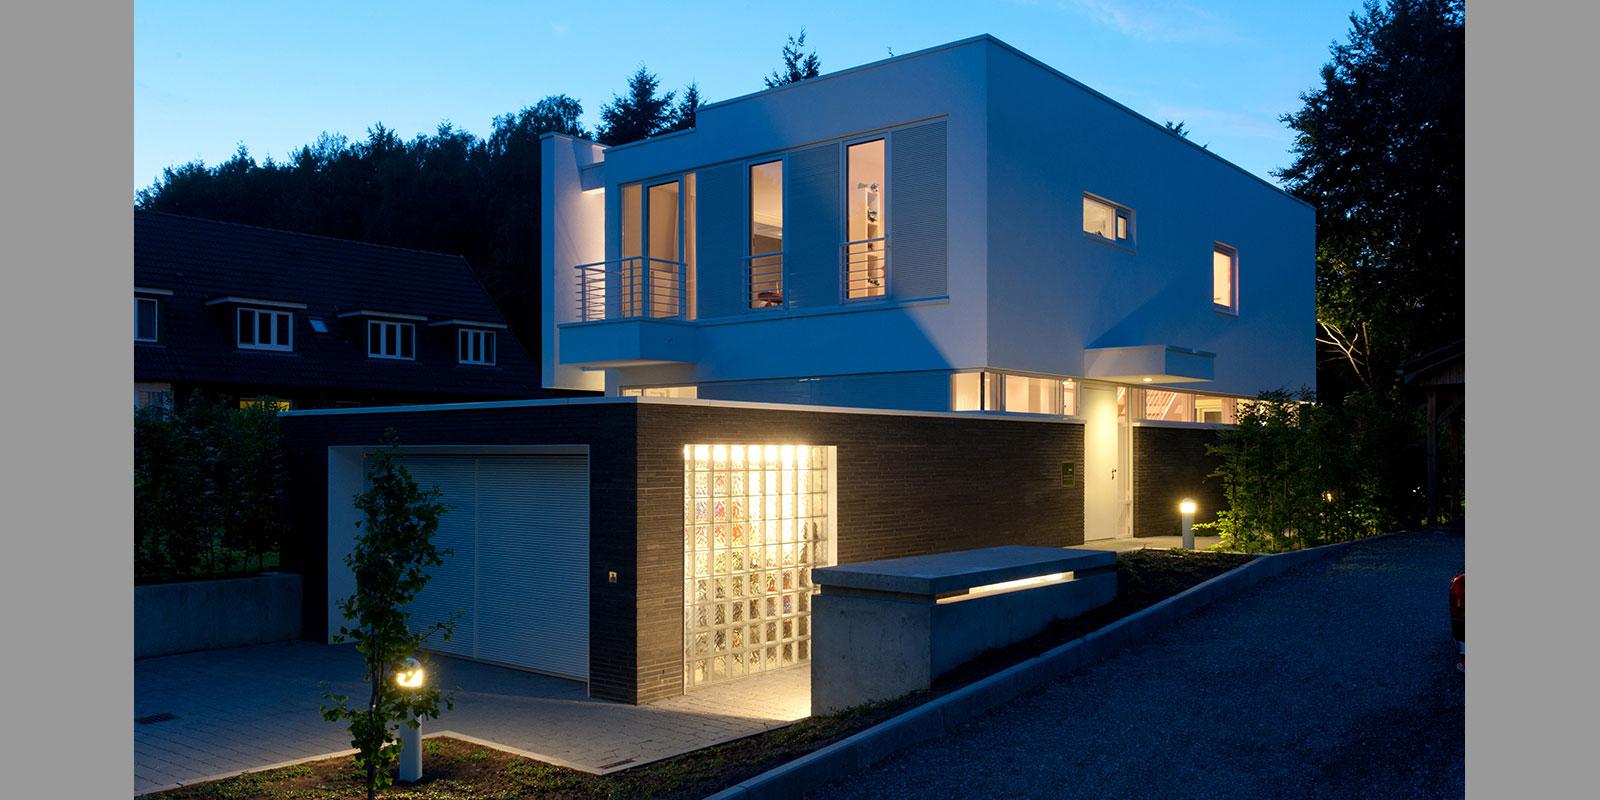 haus v architekten ingenieure oliver hagemann kmt hamburg. Black Bedroom Furniture Sets. Home Design Ideas